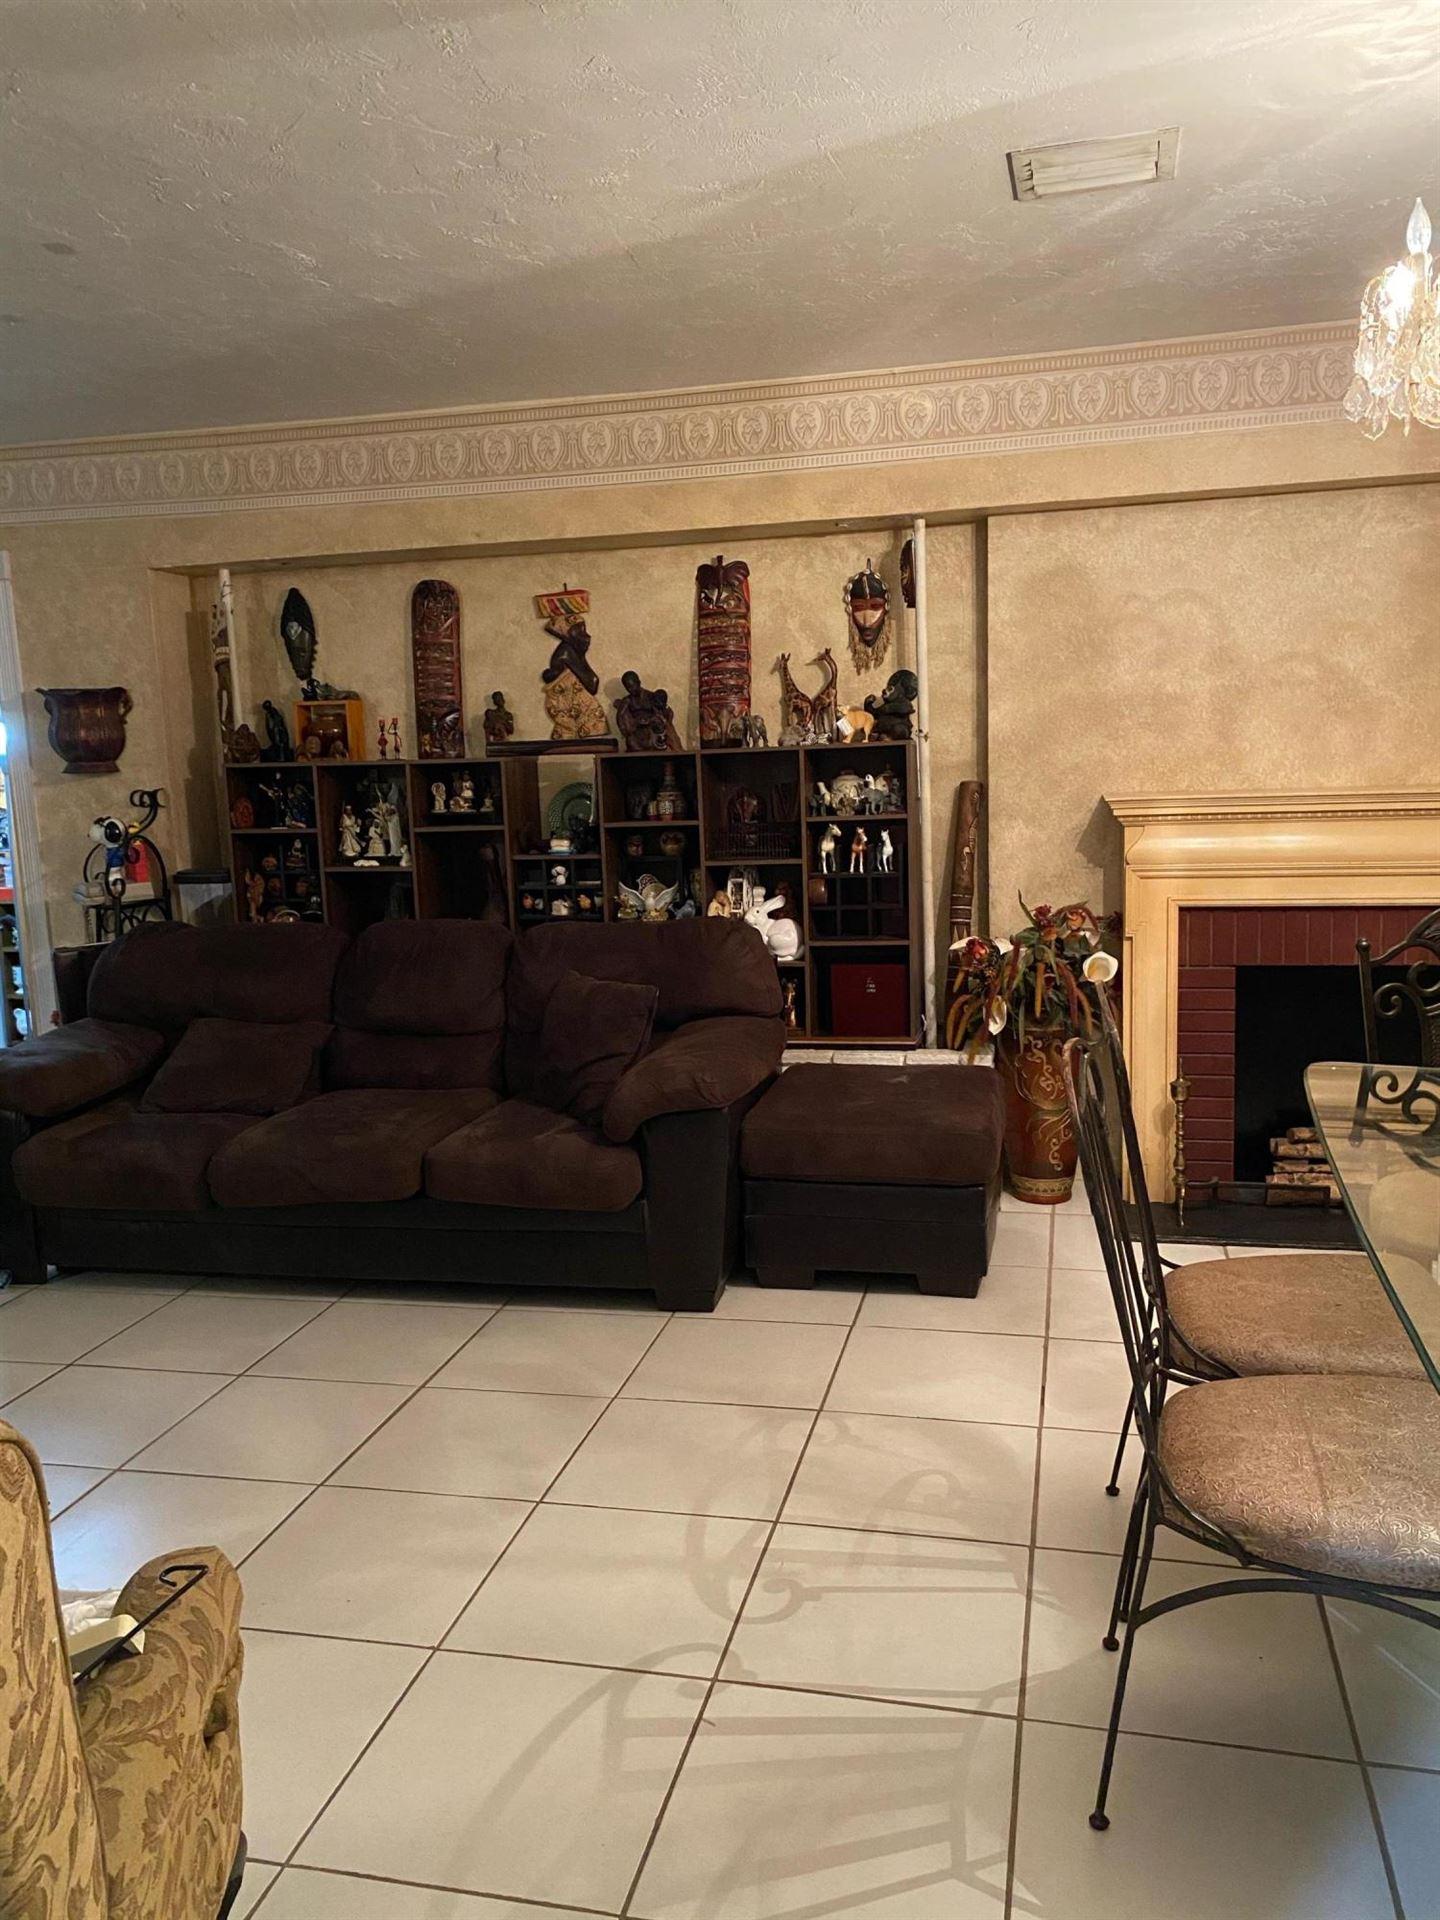 Photo of 121 SW 28 Terrace, Fort Lauderdale, FL 33312 (MLS # RX-10674223)